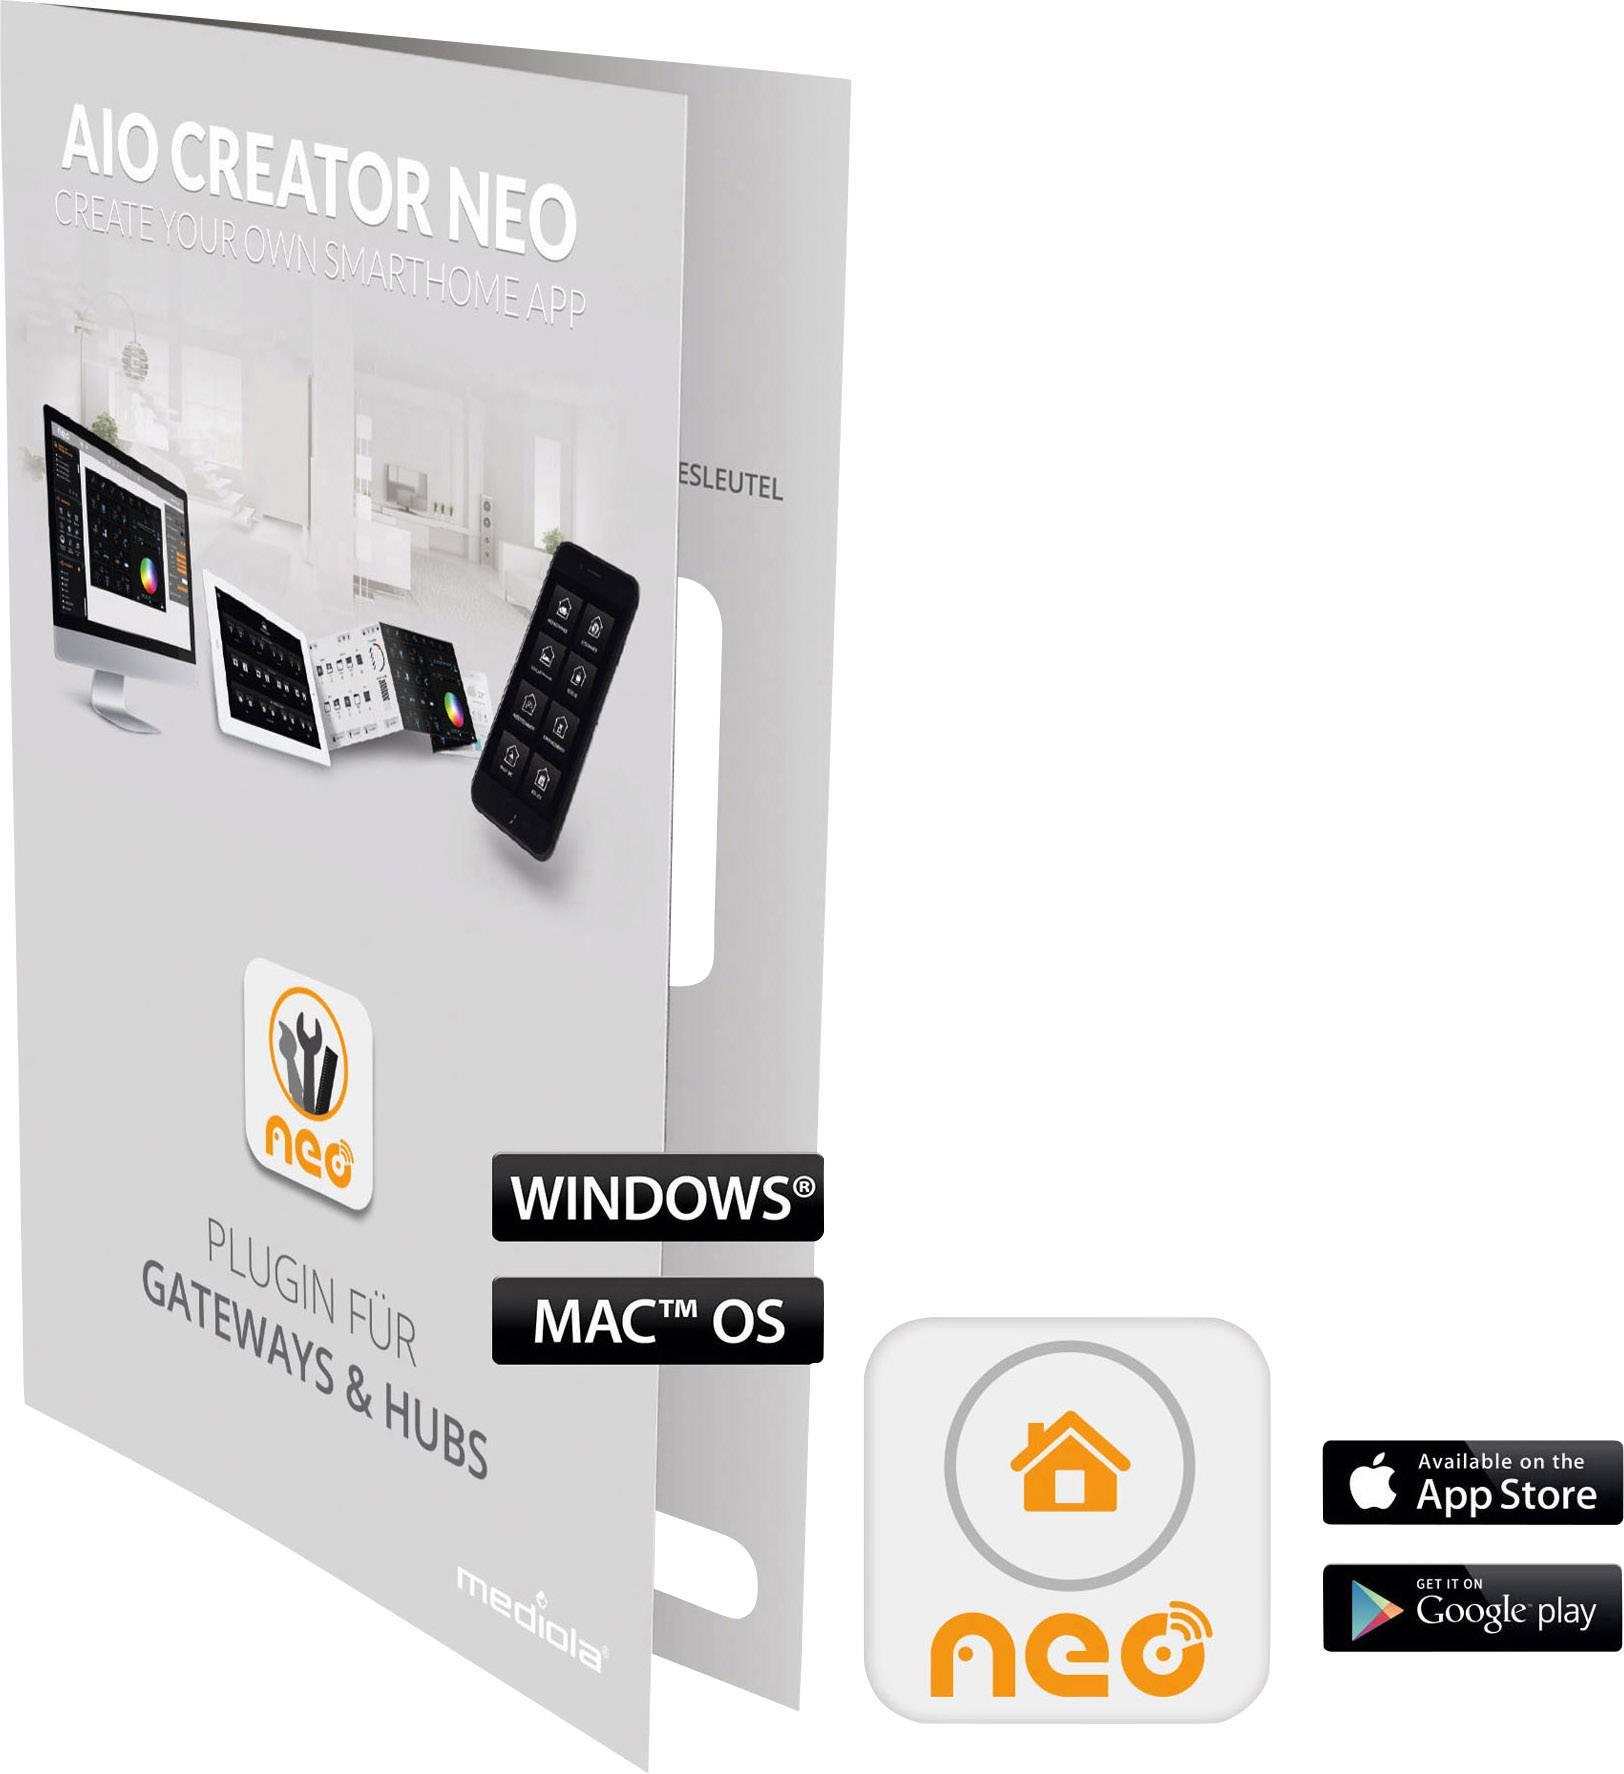 Doplňujúci software Mediola SUM-4130-b AIO CREATOR NEO Brennenstuhl Brematic